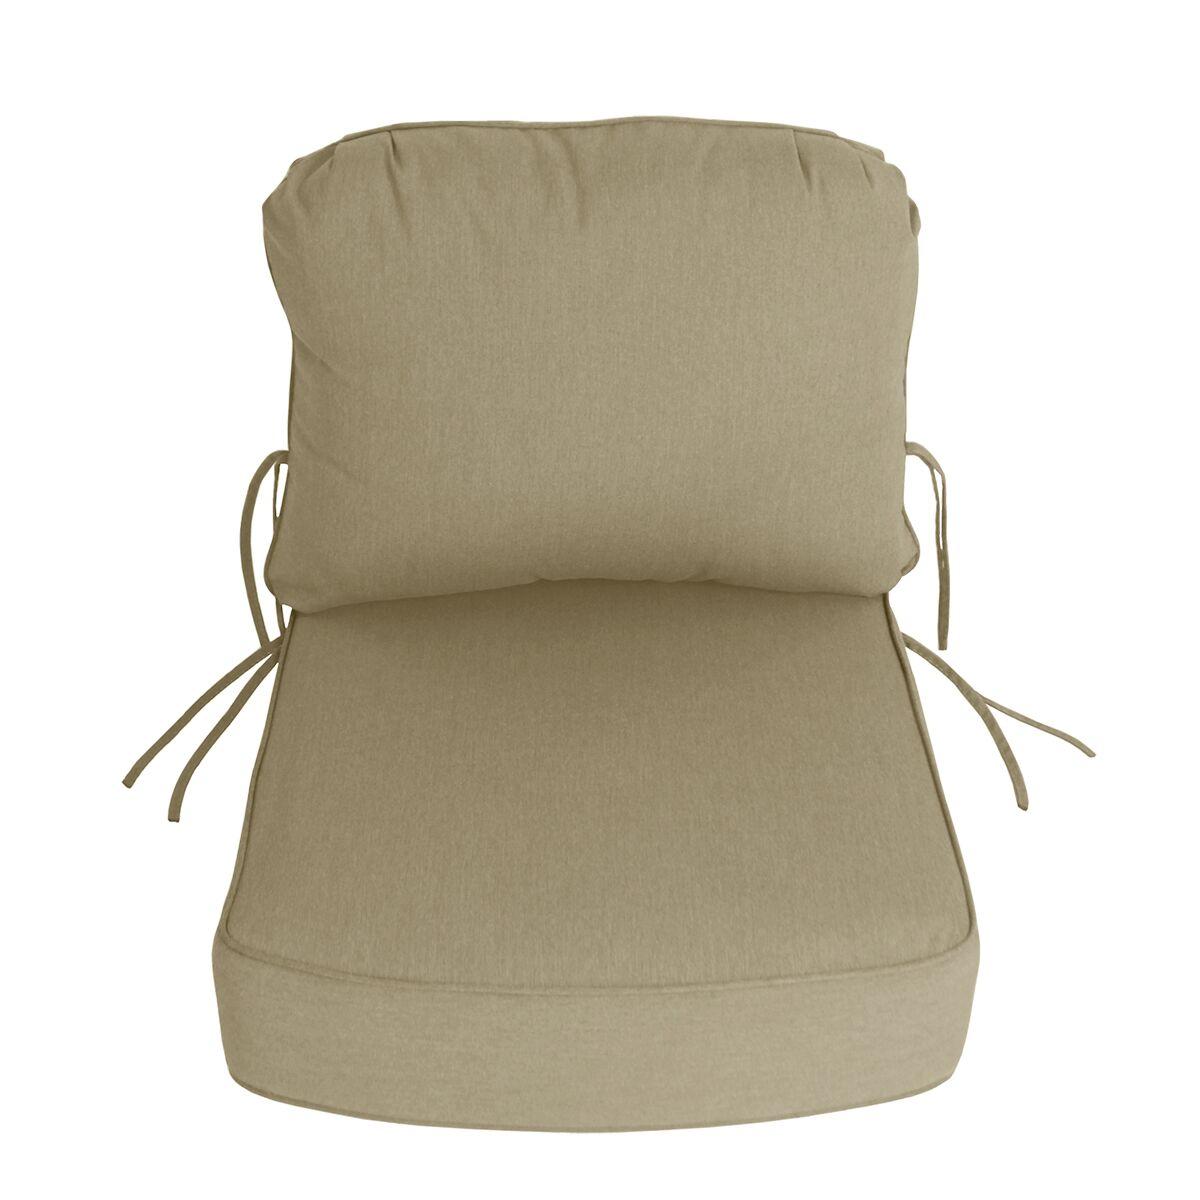 Indoor/Outdoor Sunbrella Deep Setting Chair Cushion Fabric: Antique Beige